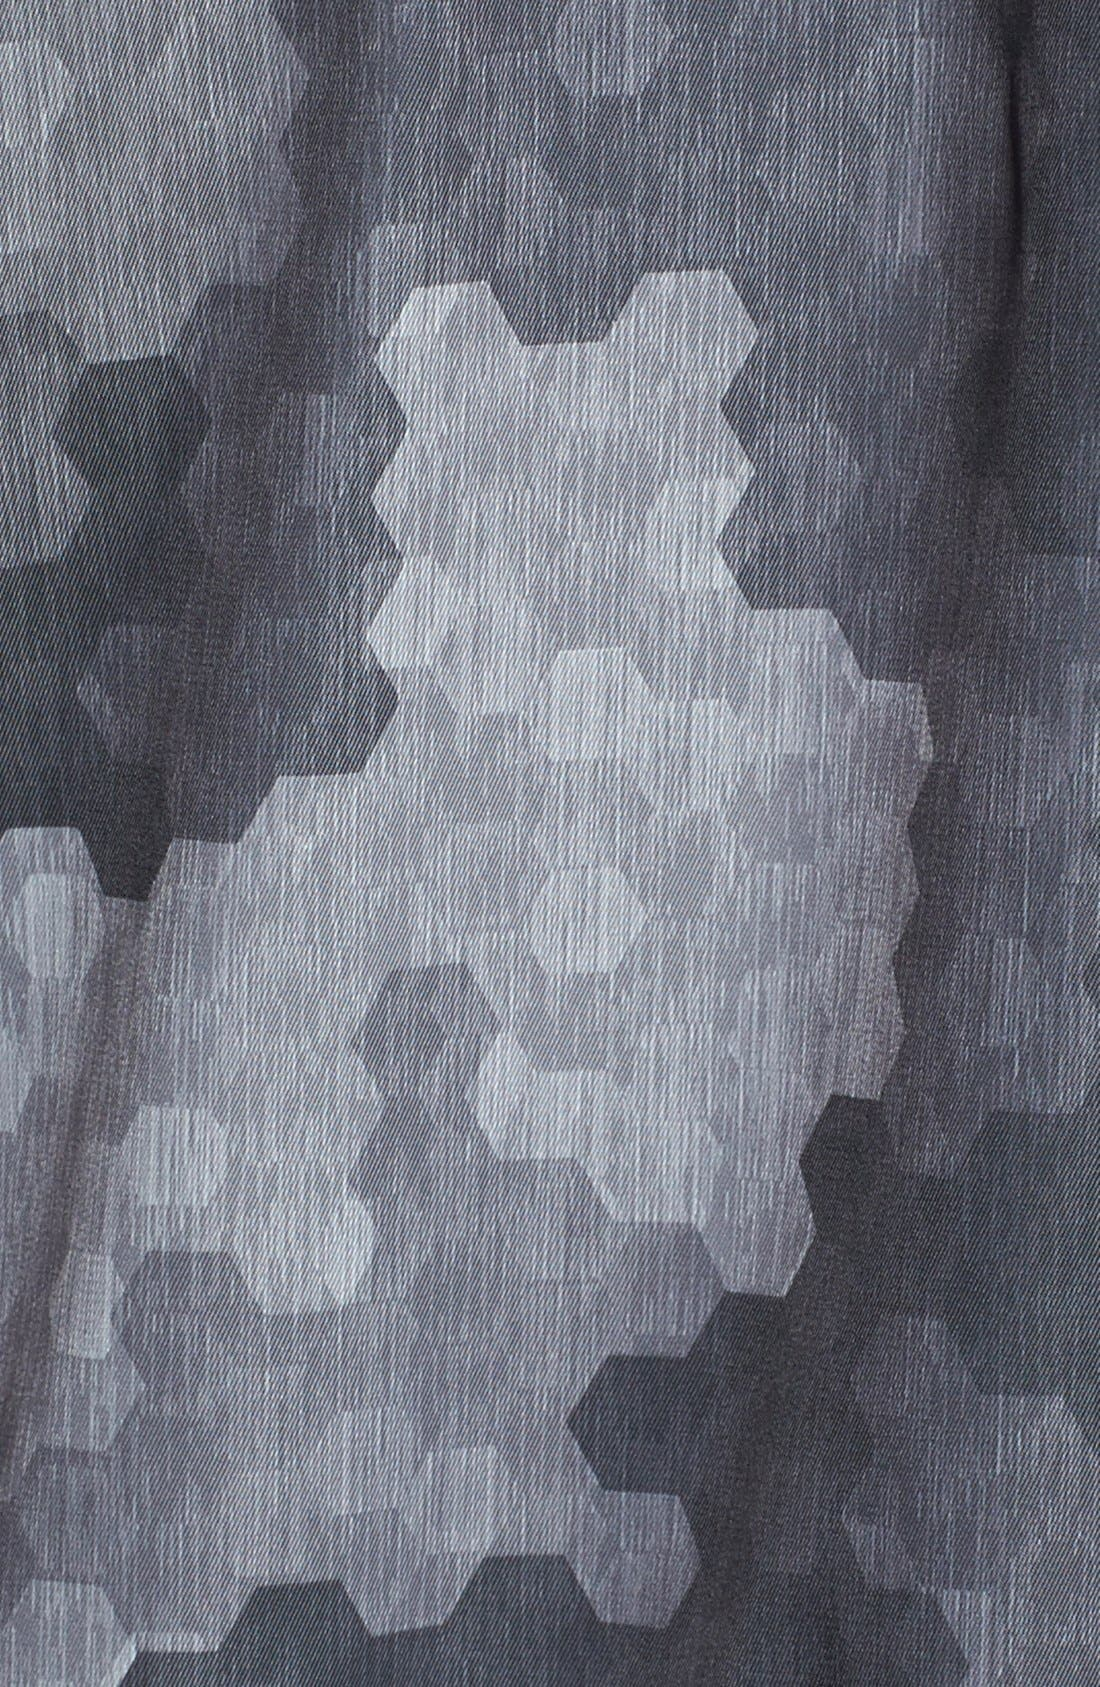 HUGO 'Meliot' Hooded Camo Trench Coat,                             Alternate thumbnail 3, color,                             Grey Camo